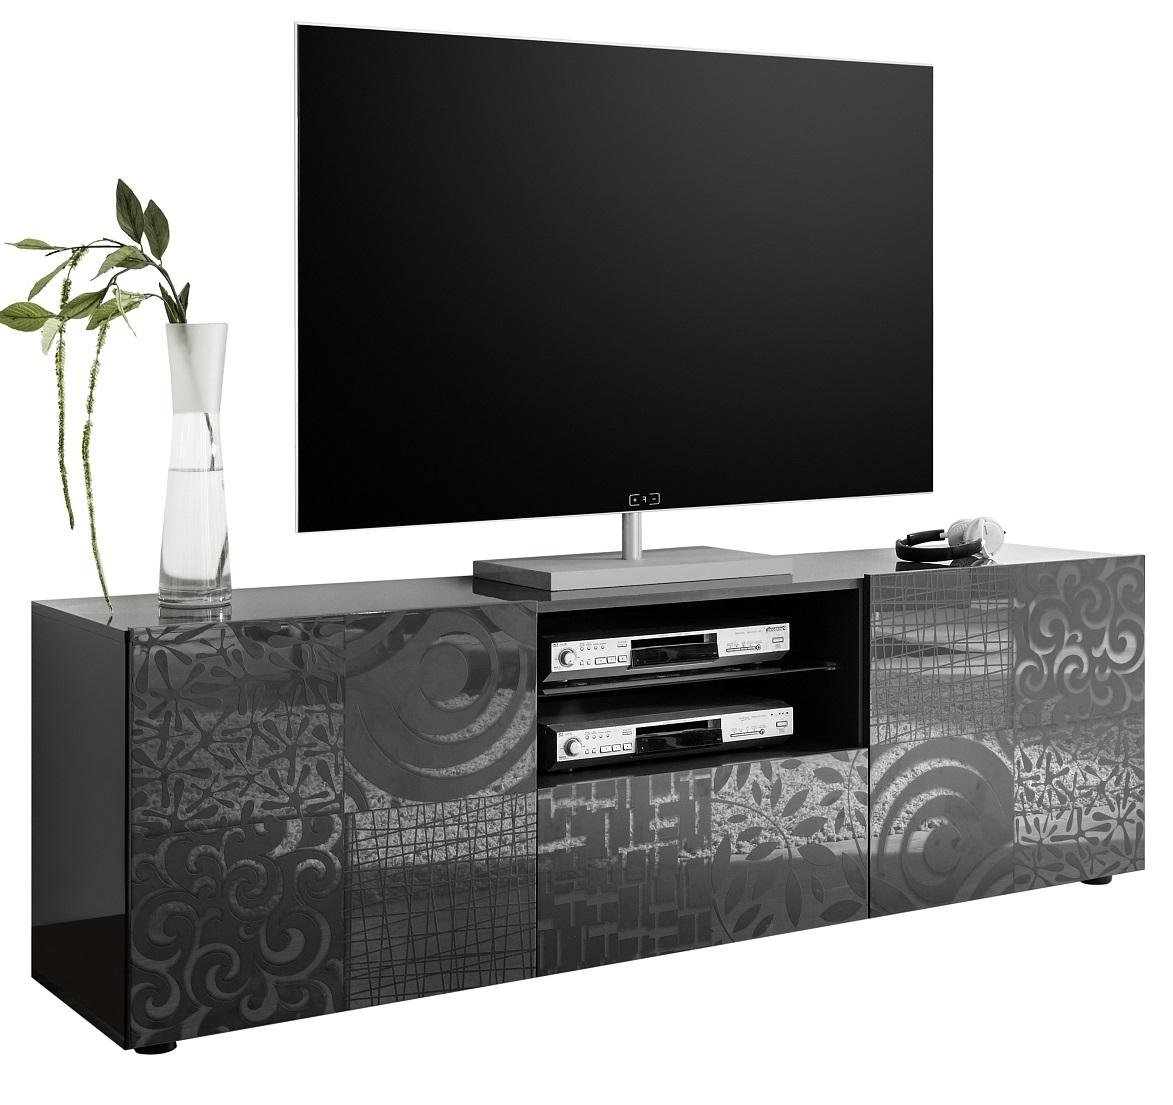 Tv-meubel Miro 181 cm breed in hoogglans antraciet | Pesaro Mobilia